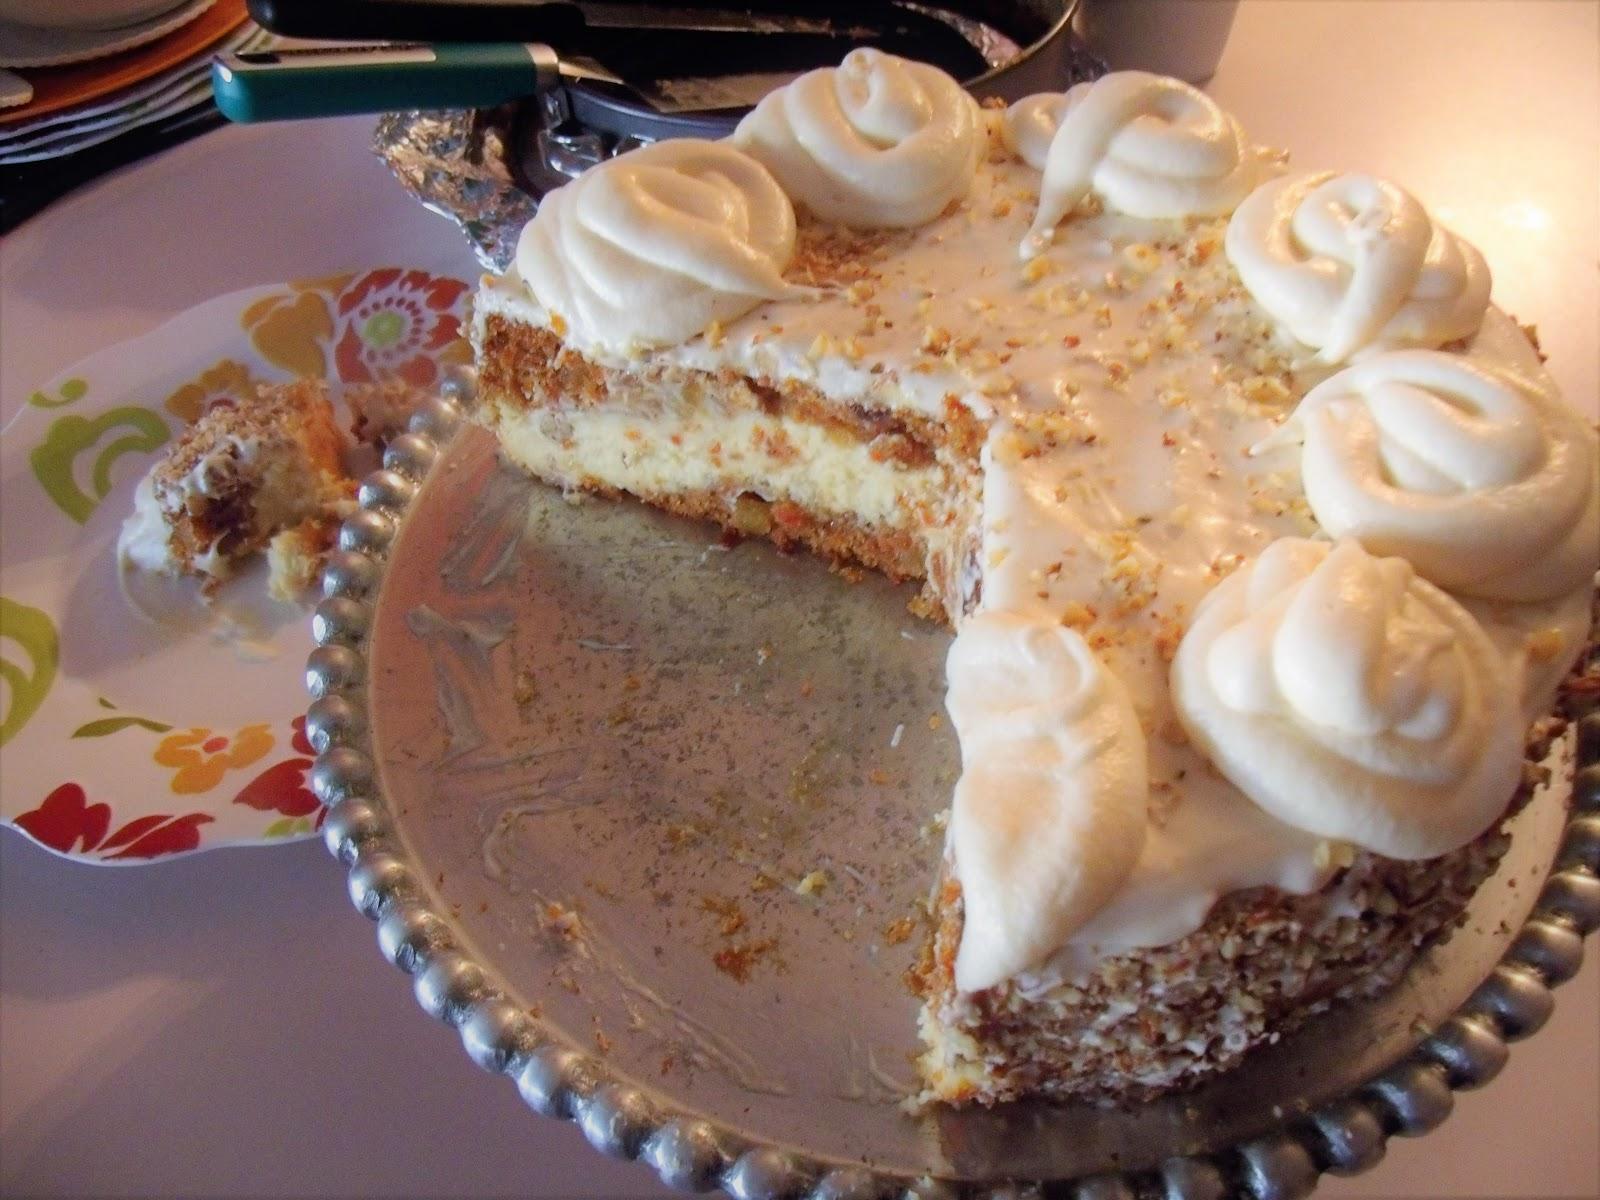 Broiled Hibiscus Carrot Cake Cheesecake Ala The Cheesecake Factory